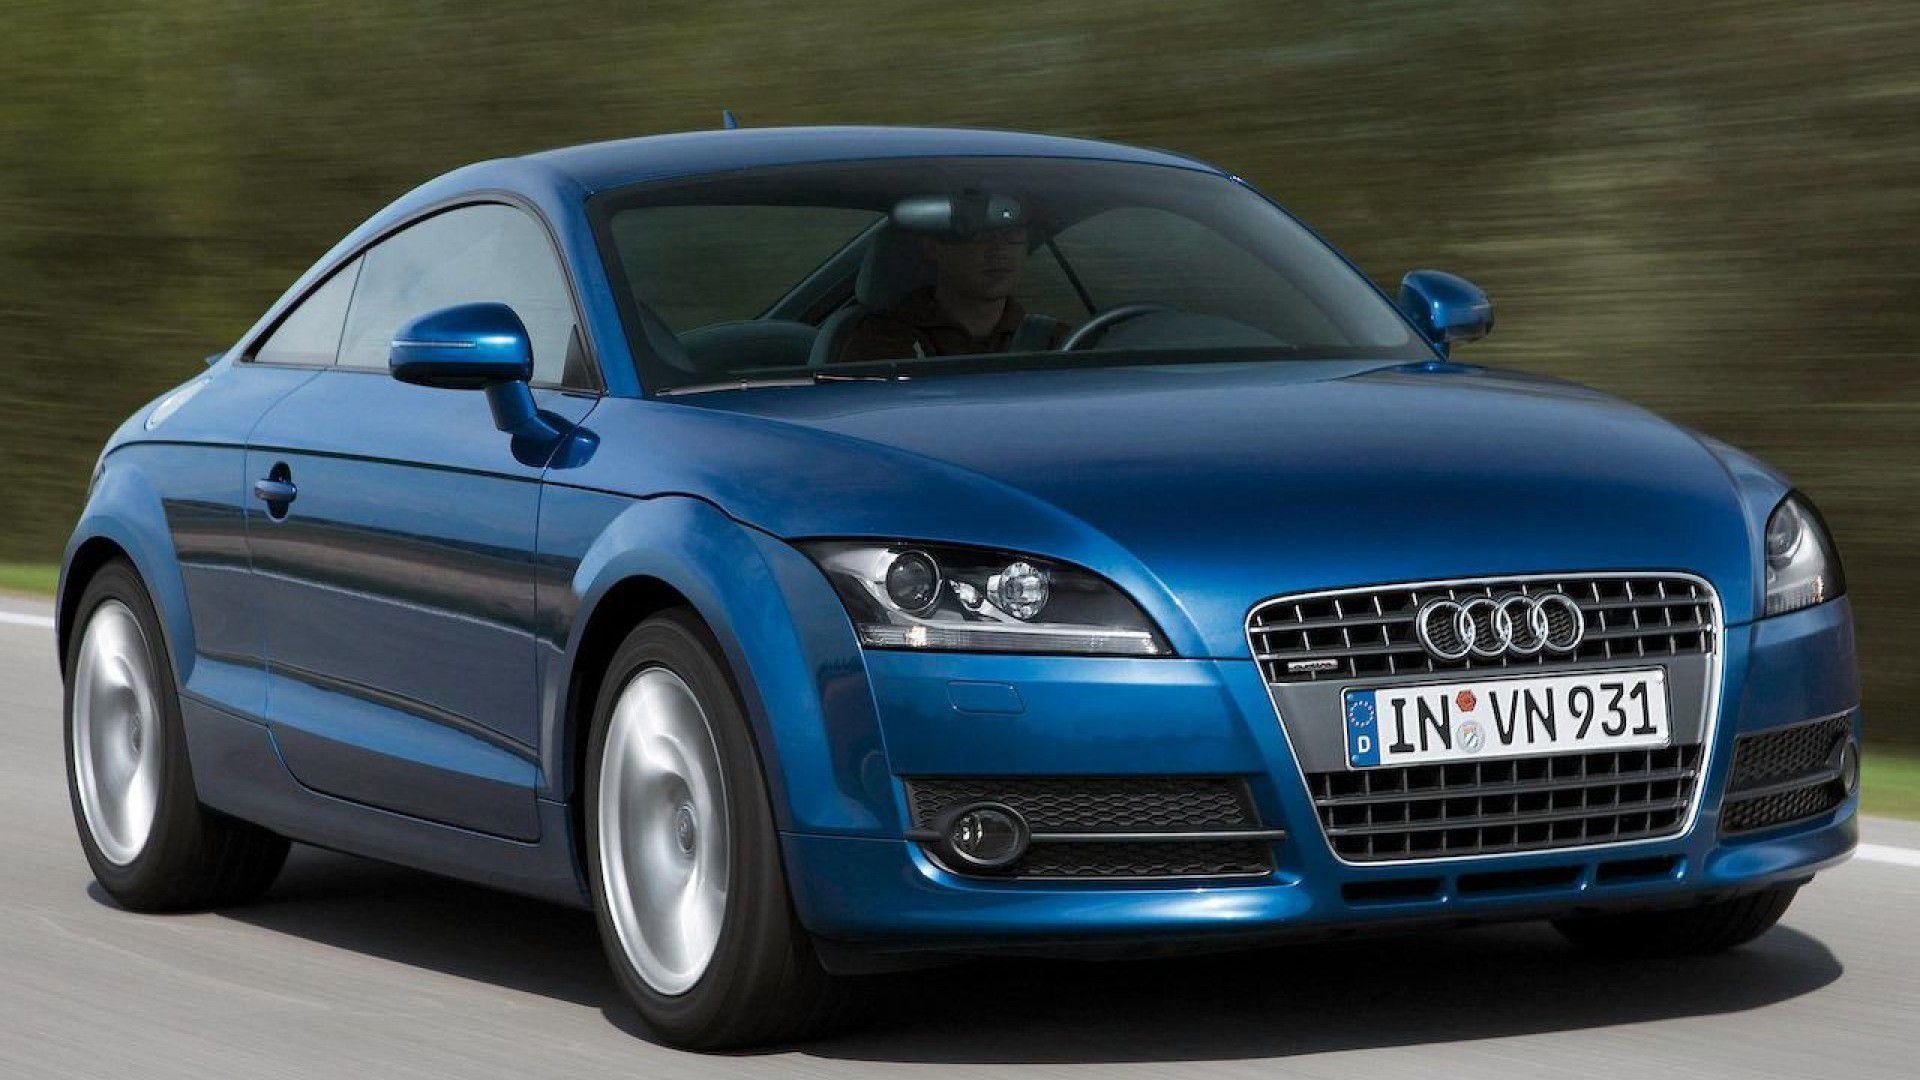 Audi TT 2.0 TDI quattro (2008 to Present)